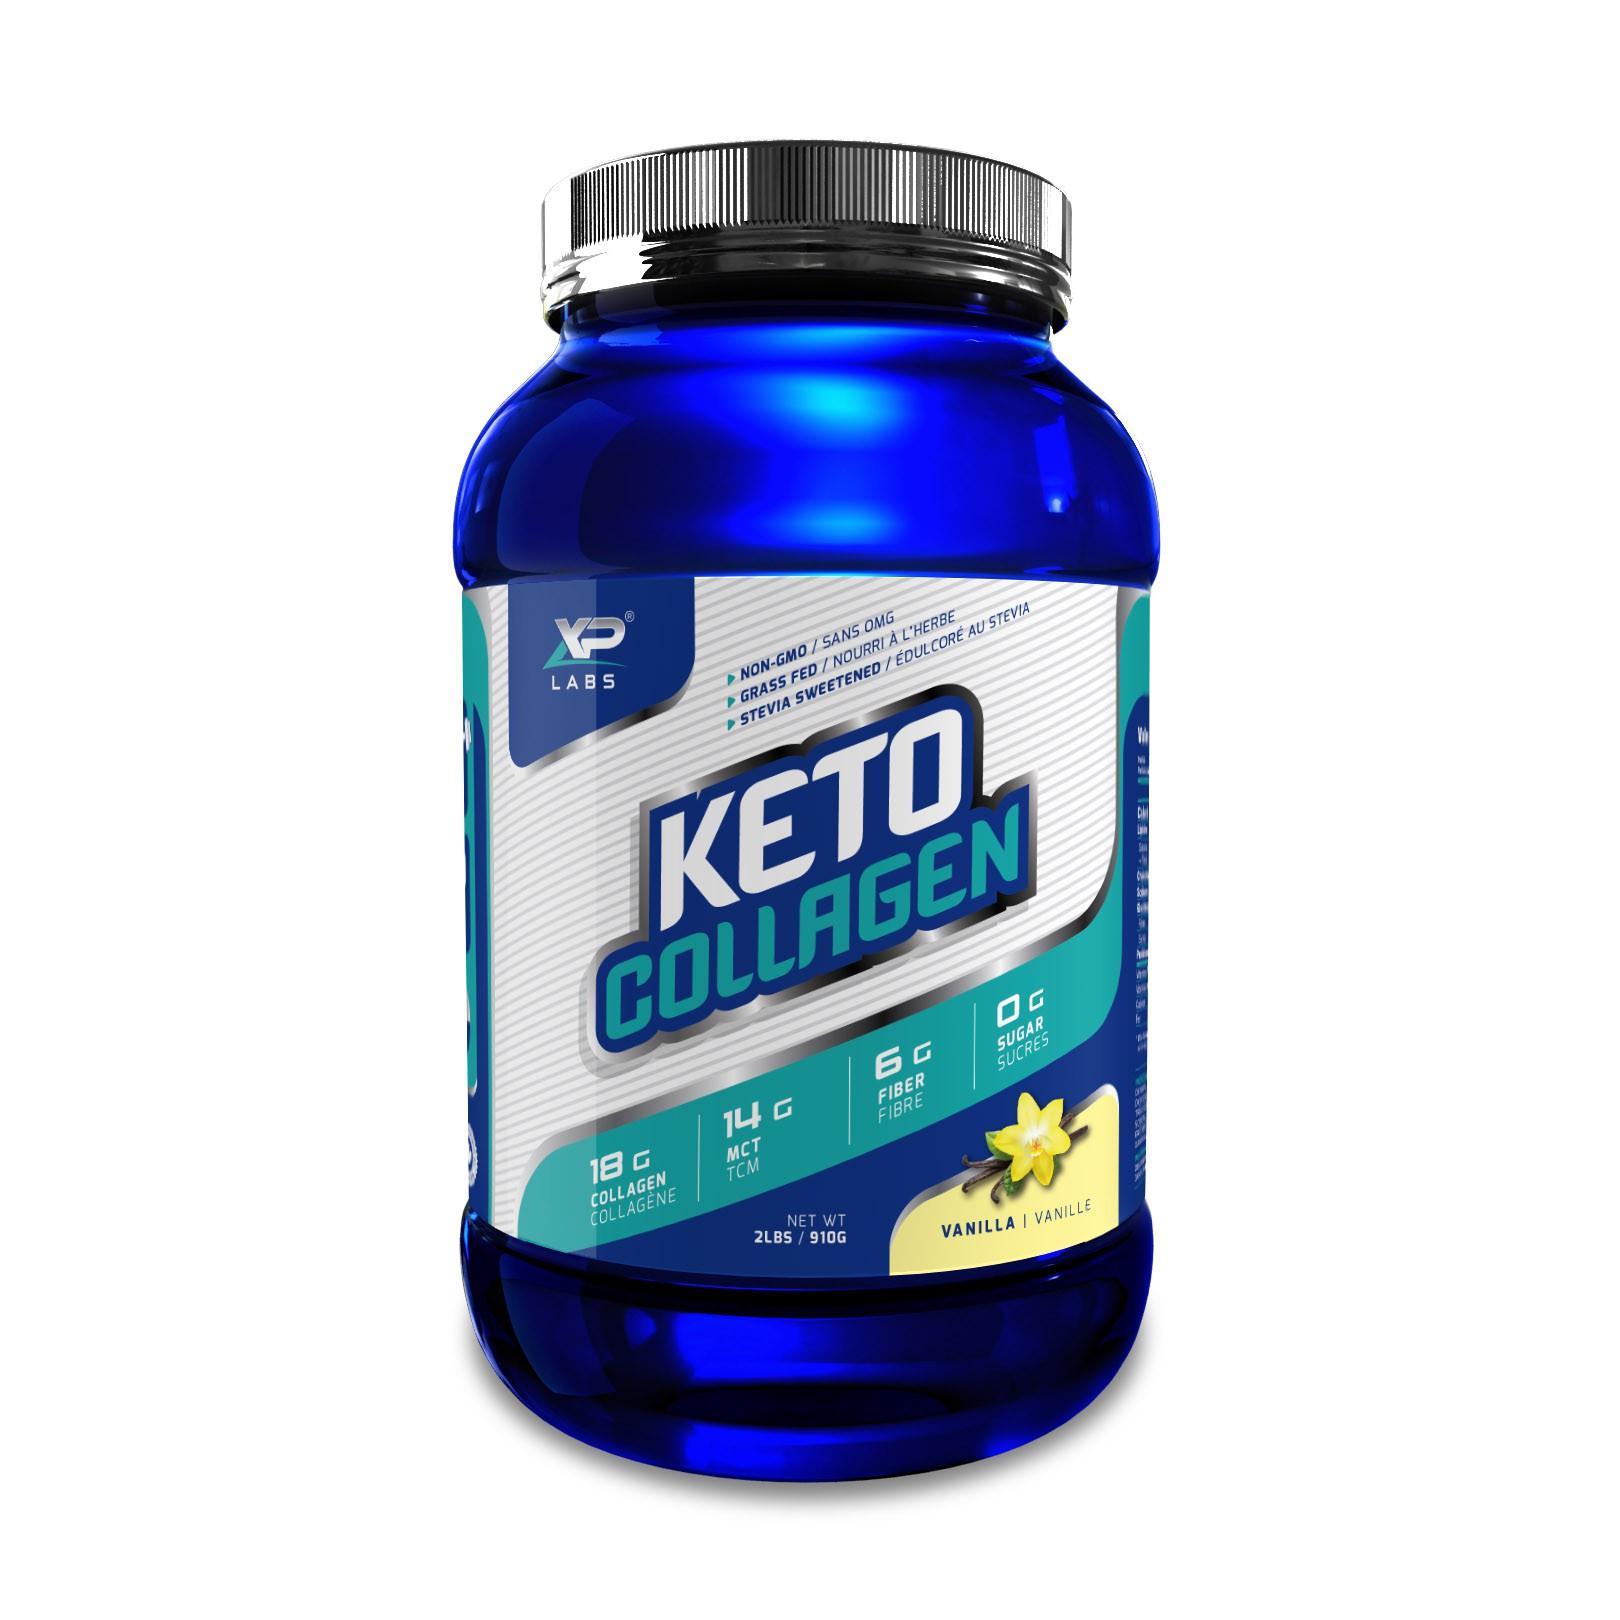 Keto Collagen - 2 Labels